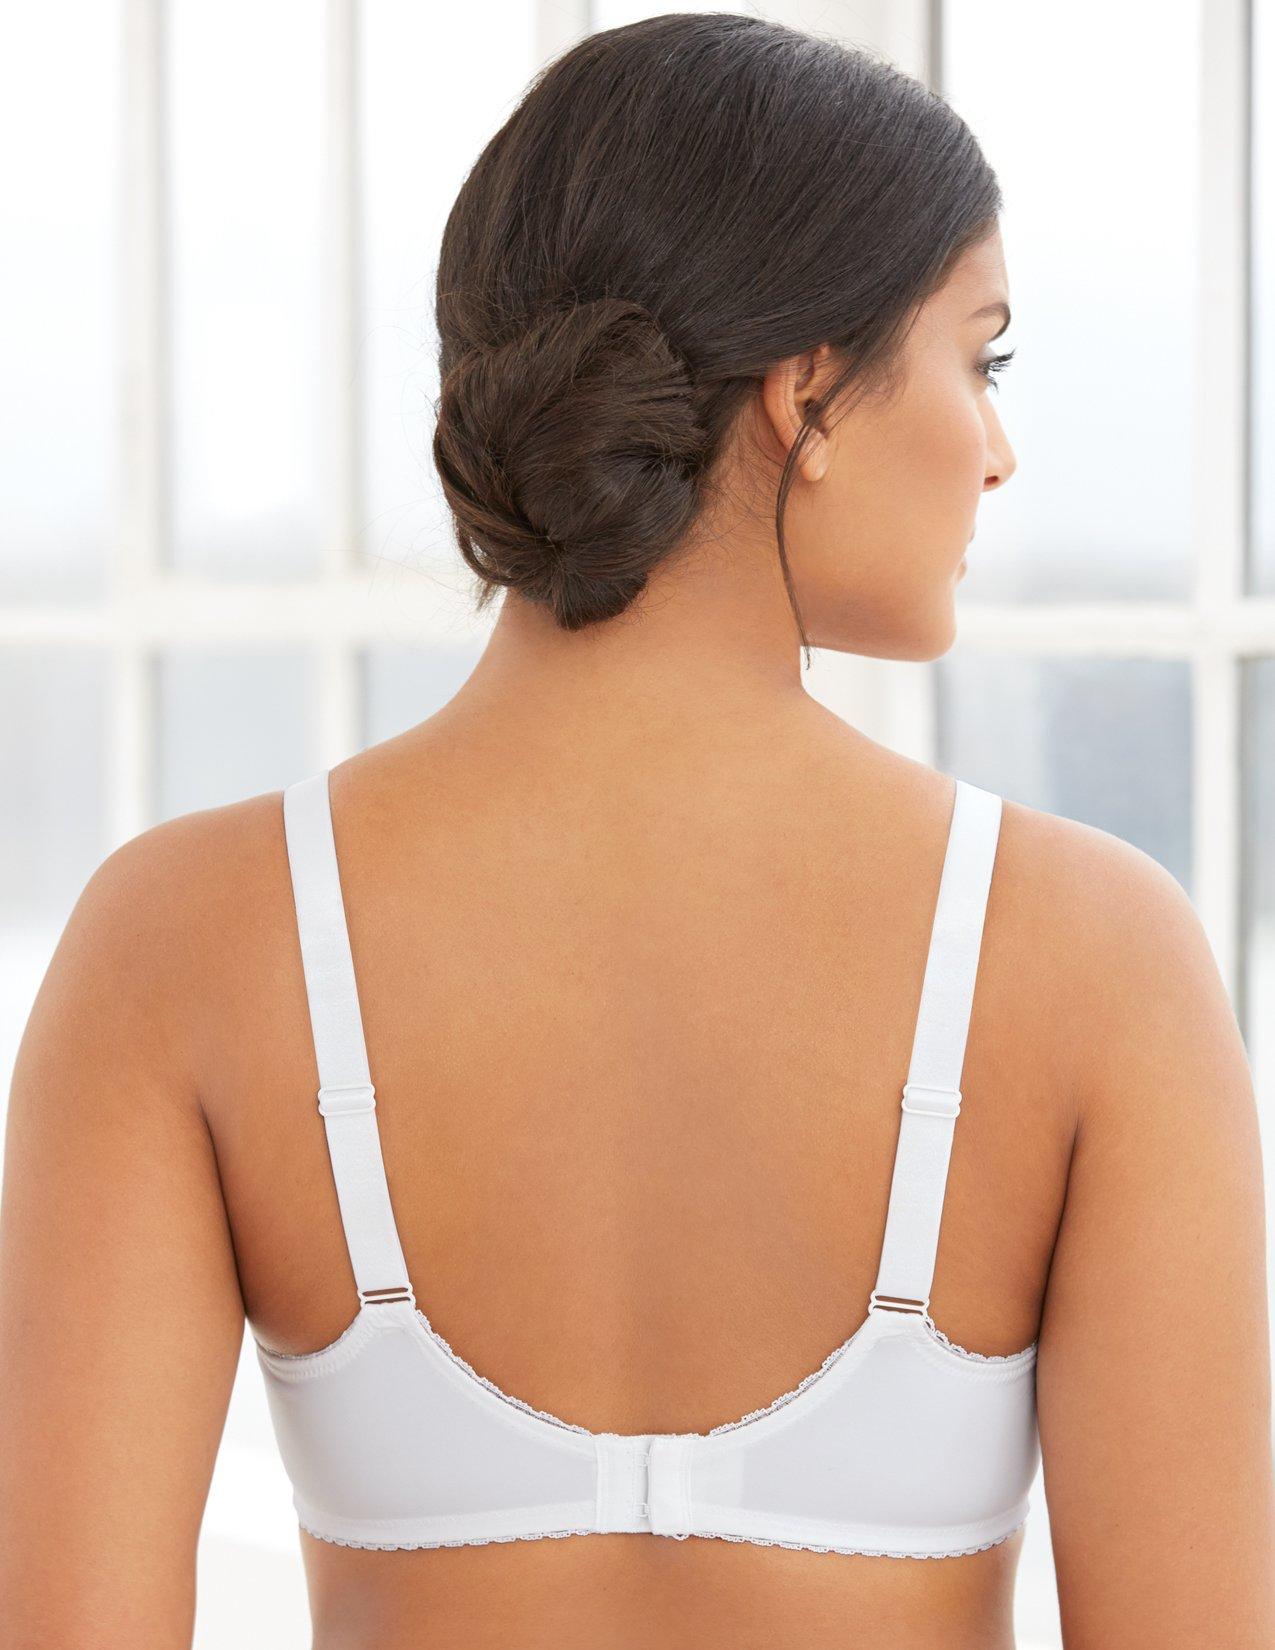 1521f4b875 Glamorise Women s Full Figure Wonderwire Lace Bra  9845 - 9845   Everyday  Bras   Clothing